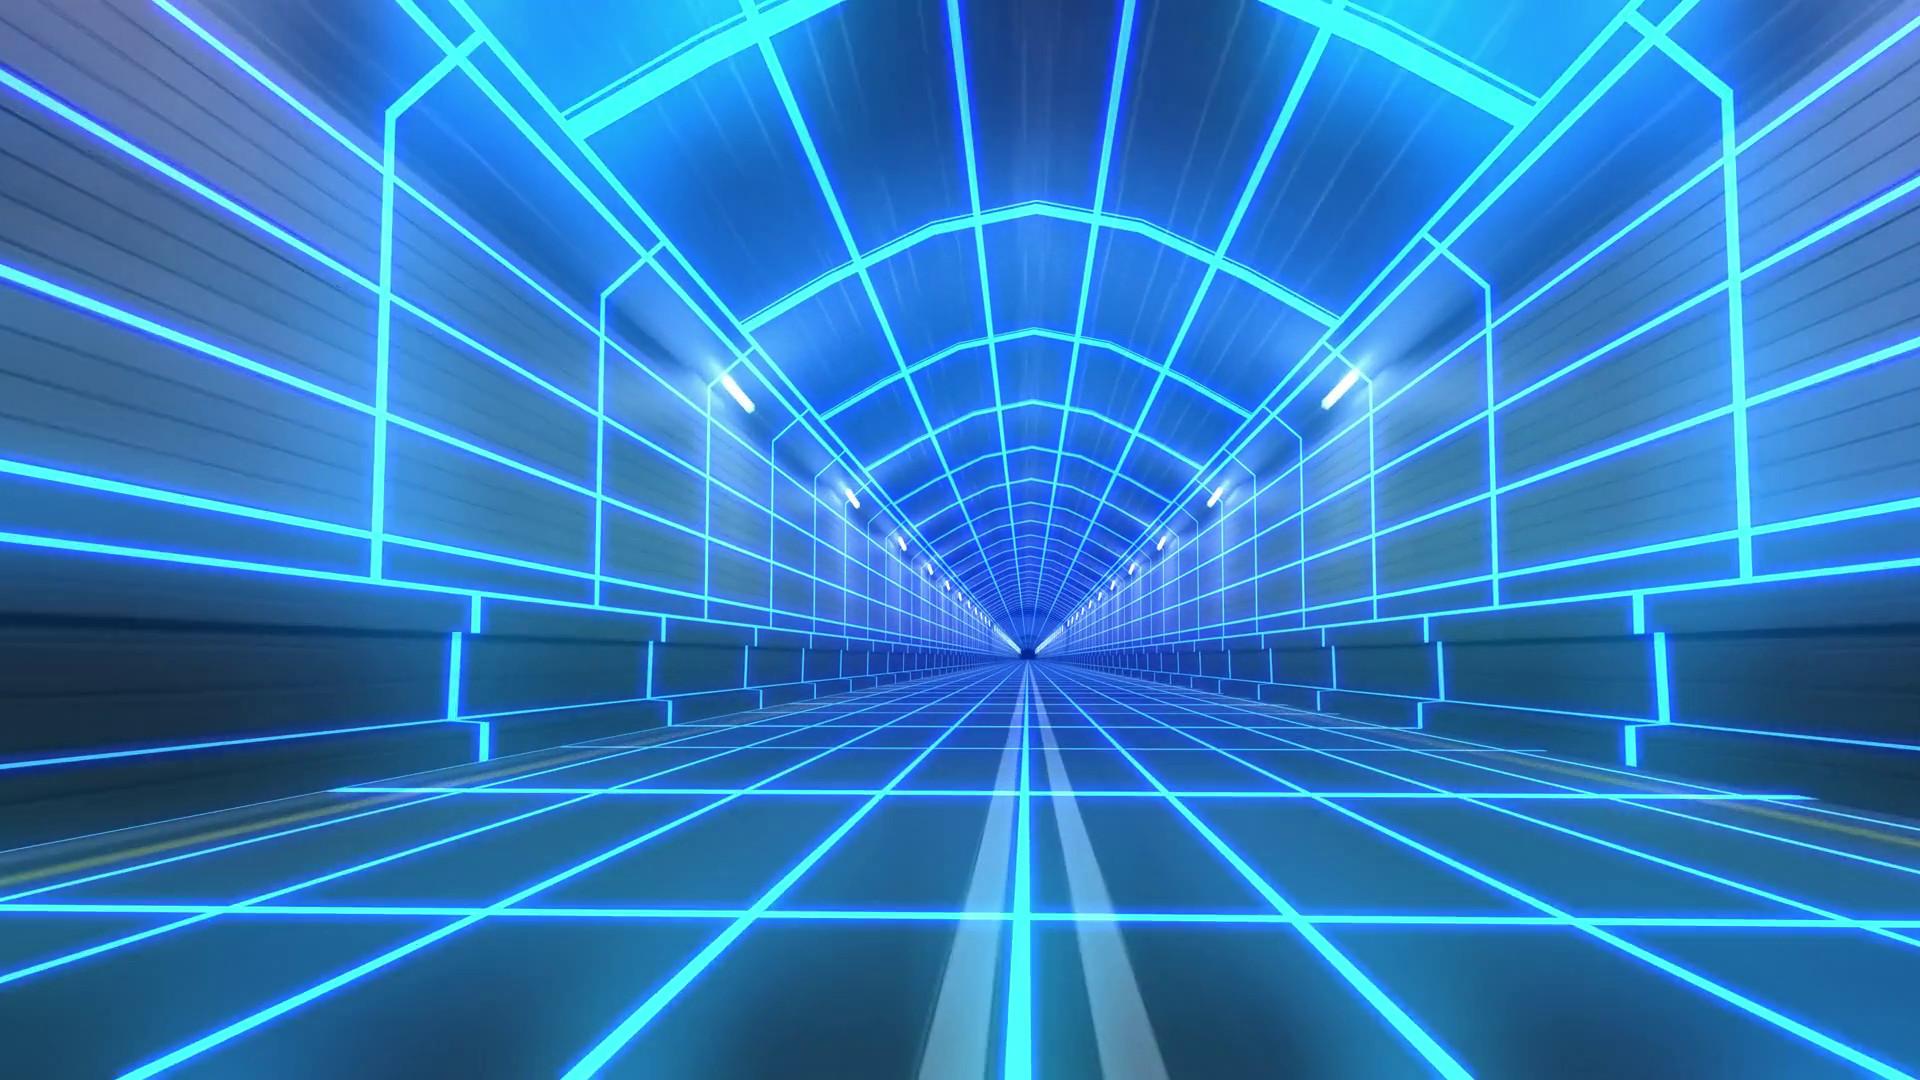 Loop tunnel 80s retro tron future wireframe arcade road tube subway neon  glow 4k Motion Background – VideoBlocks